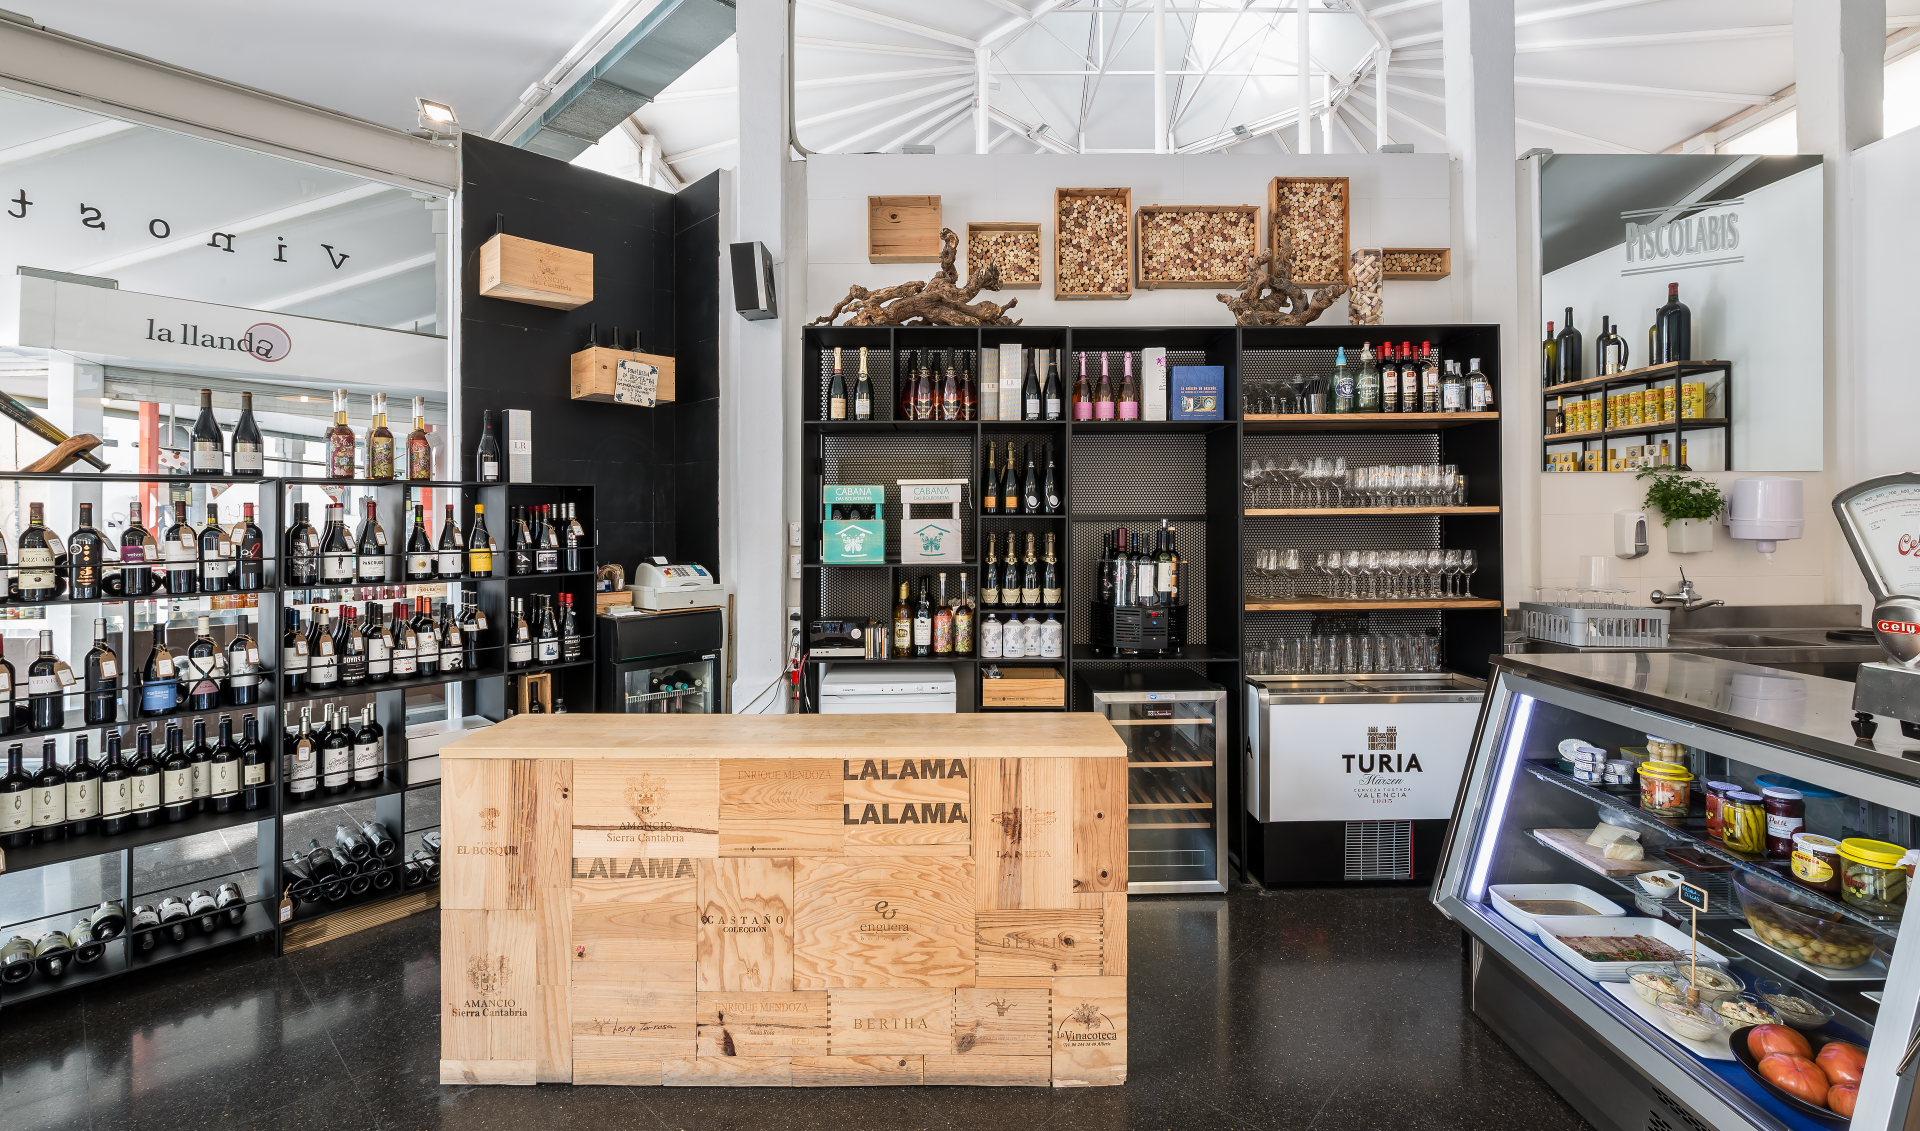 fotografia-arquitectura-valencia-german-cabo-paseo-globo-vinostrum-mercado-mossen-sorell (2)